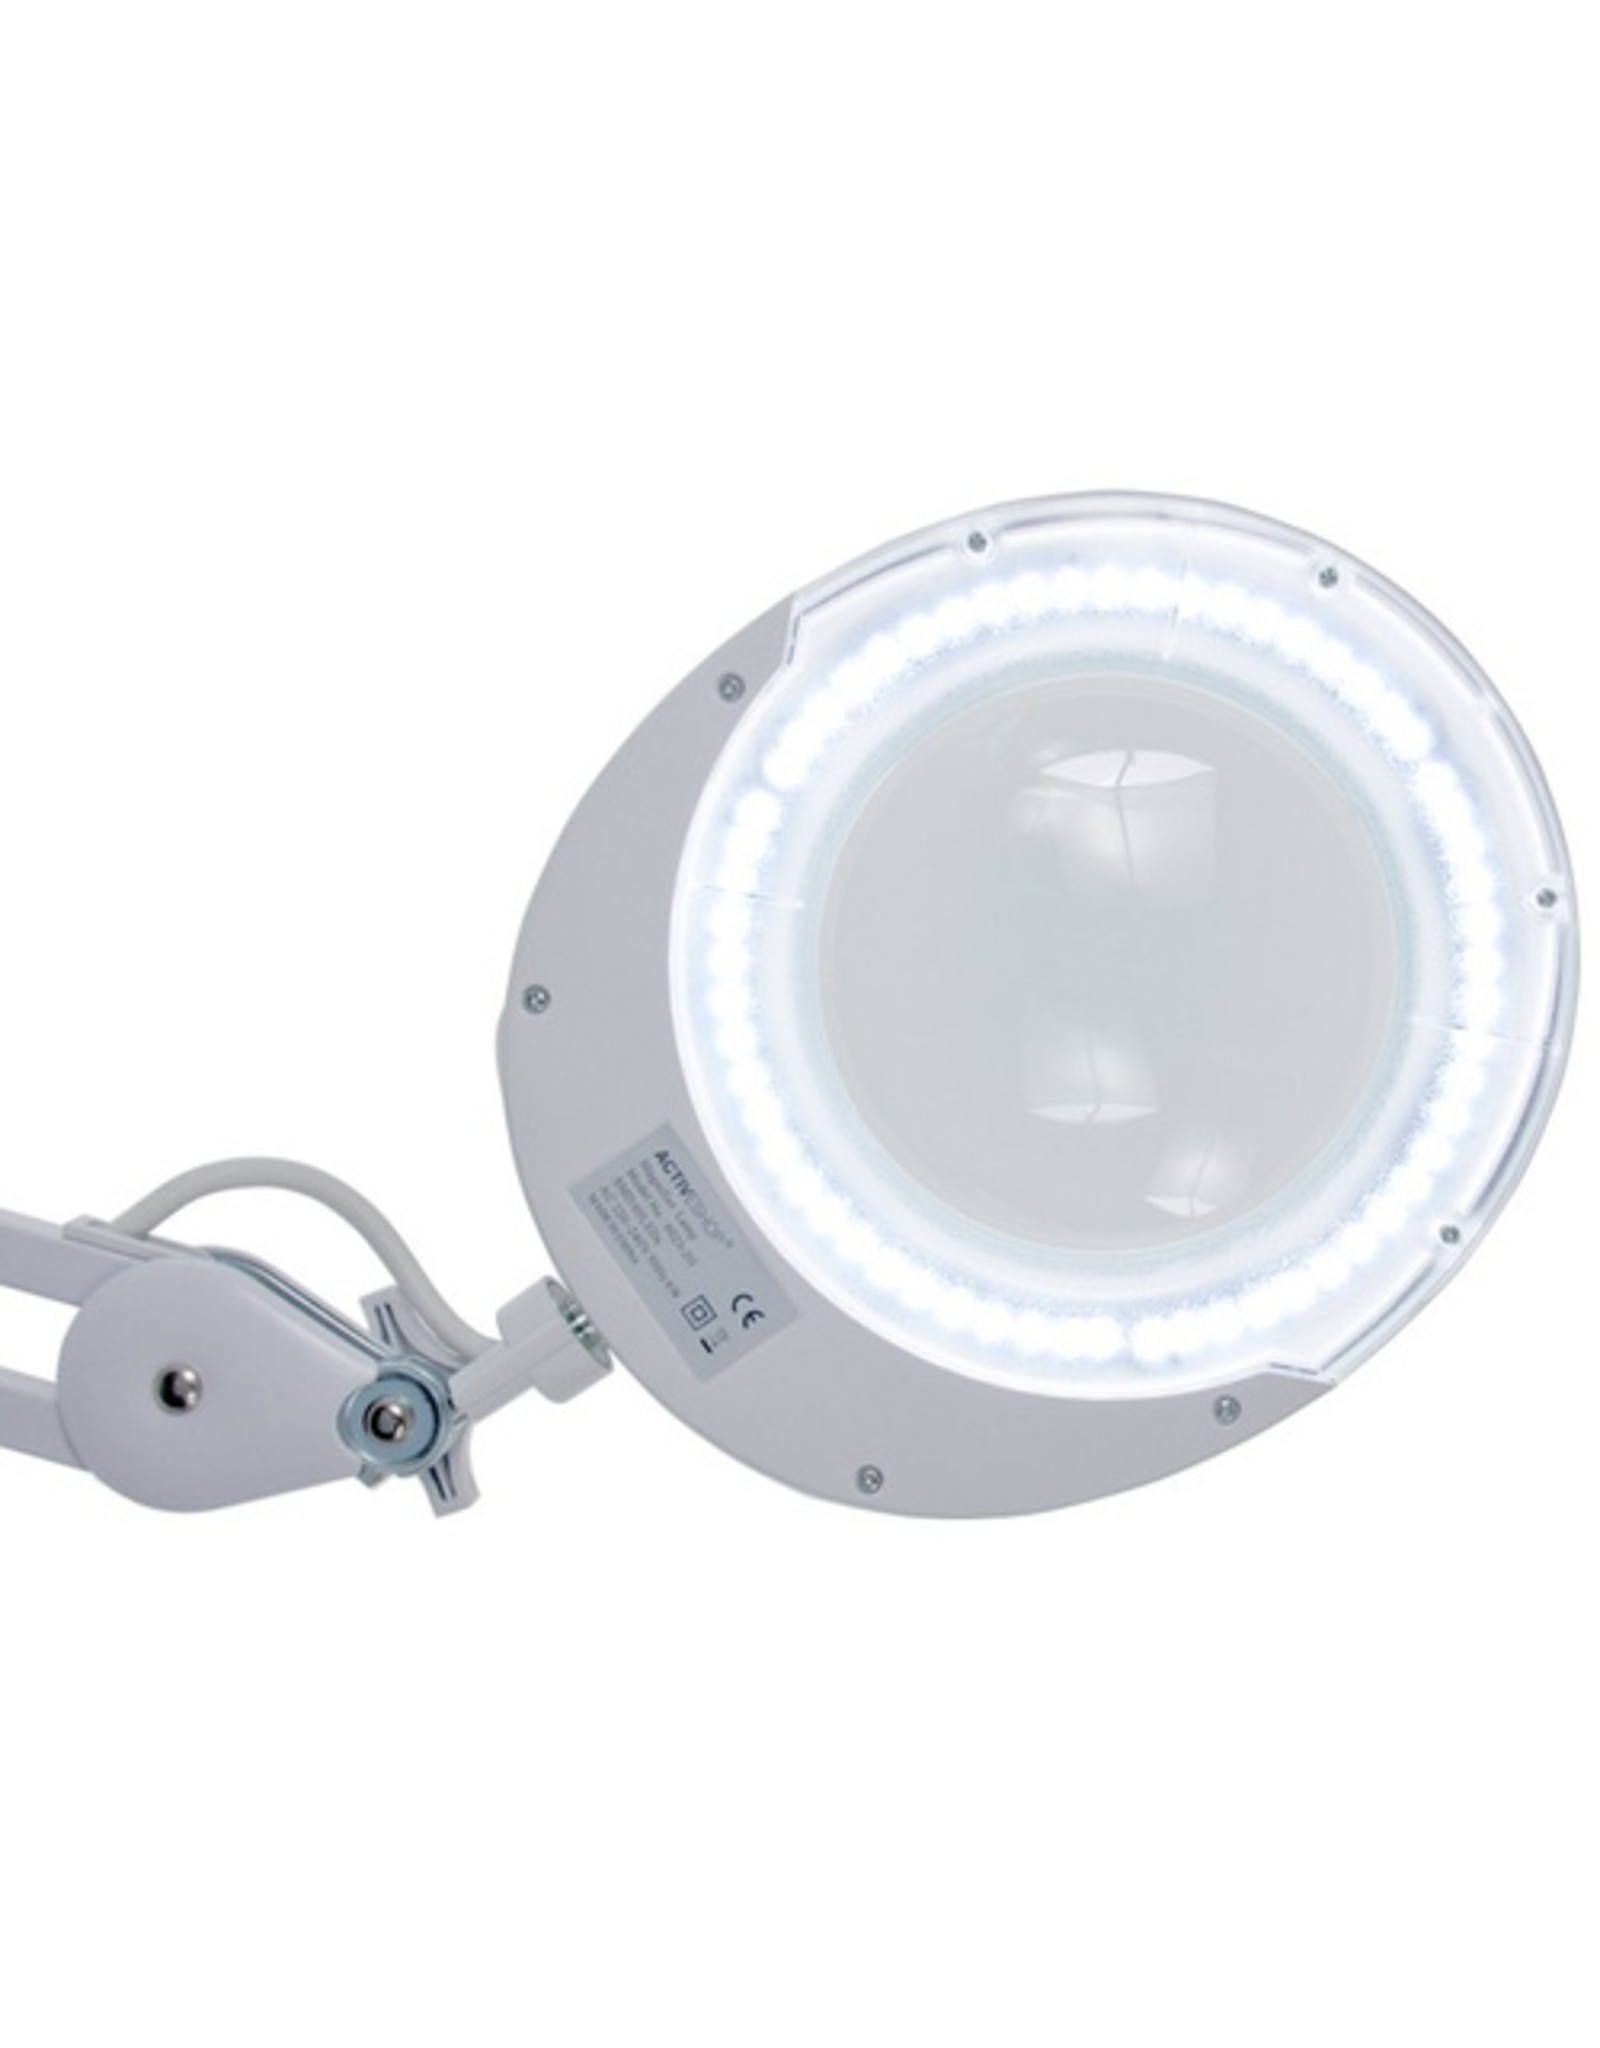 Merkloos Loeplamp Intensety LED + Rolstatief